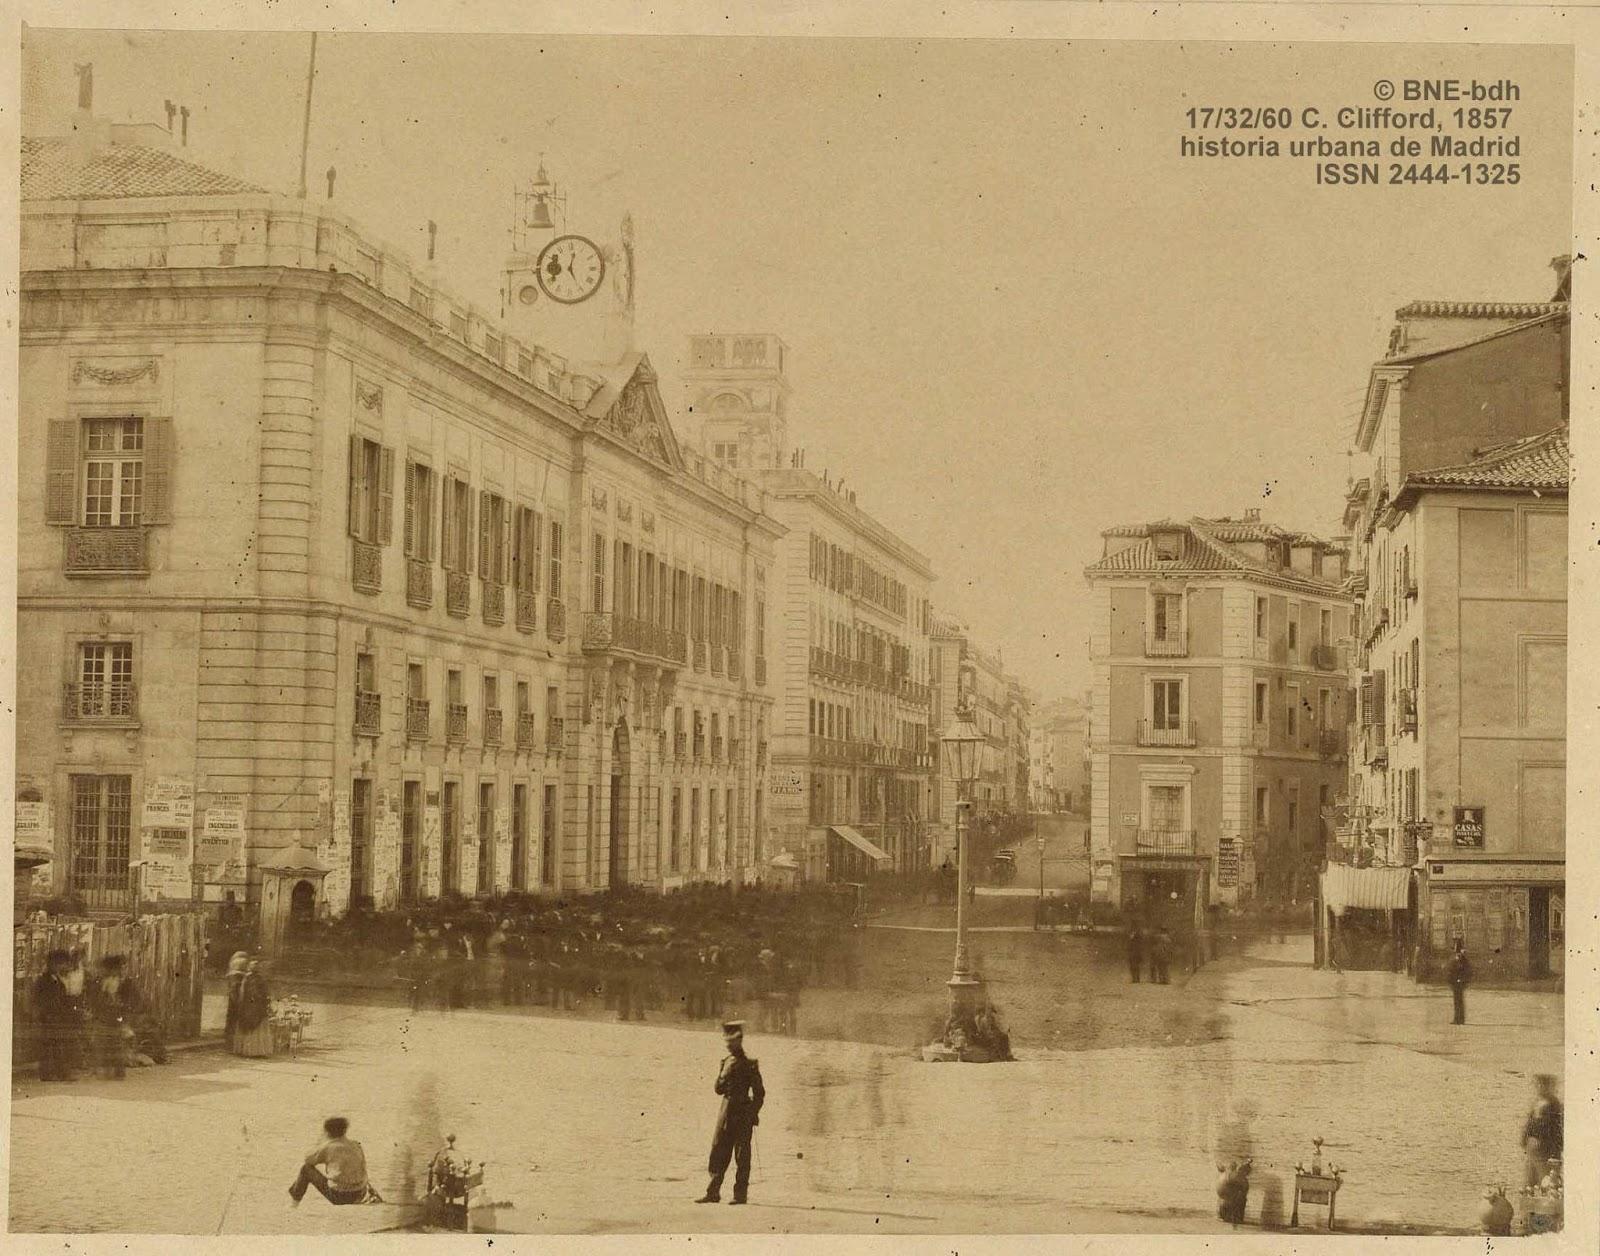 Historia urbana de madrid el reloj de la puerta del sol for Puerta del sol hoy en directo